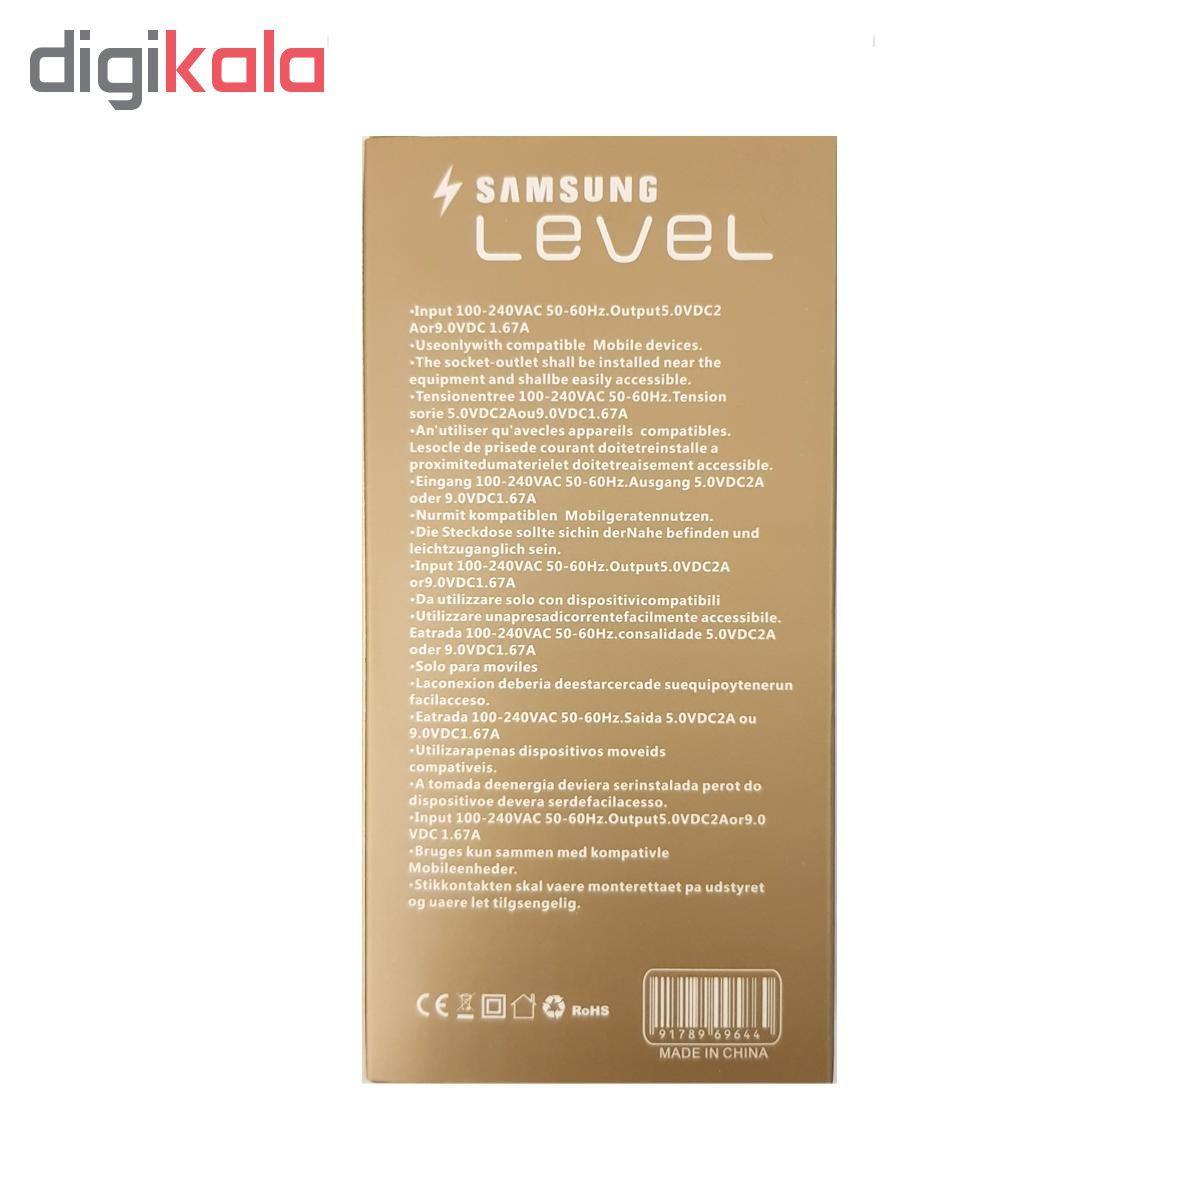 مجموعه لوازم جانبی موبایل مدل Level S6 main 1 2